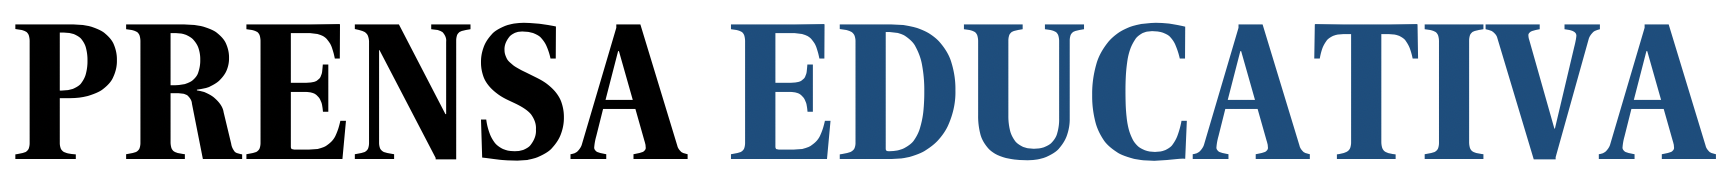 Prensa Educativa